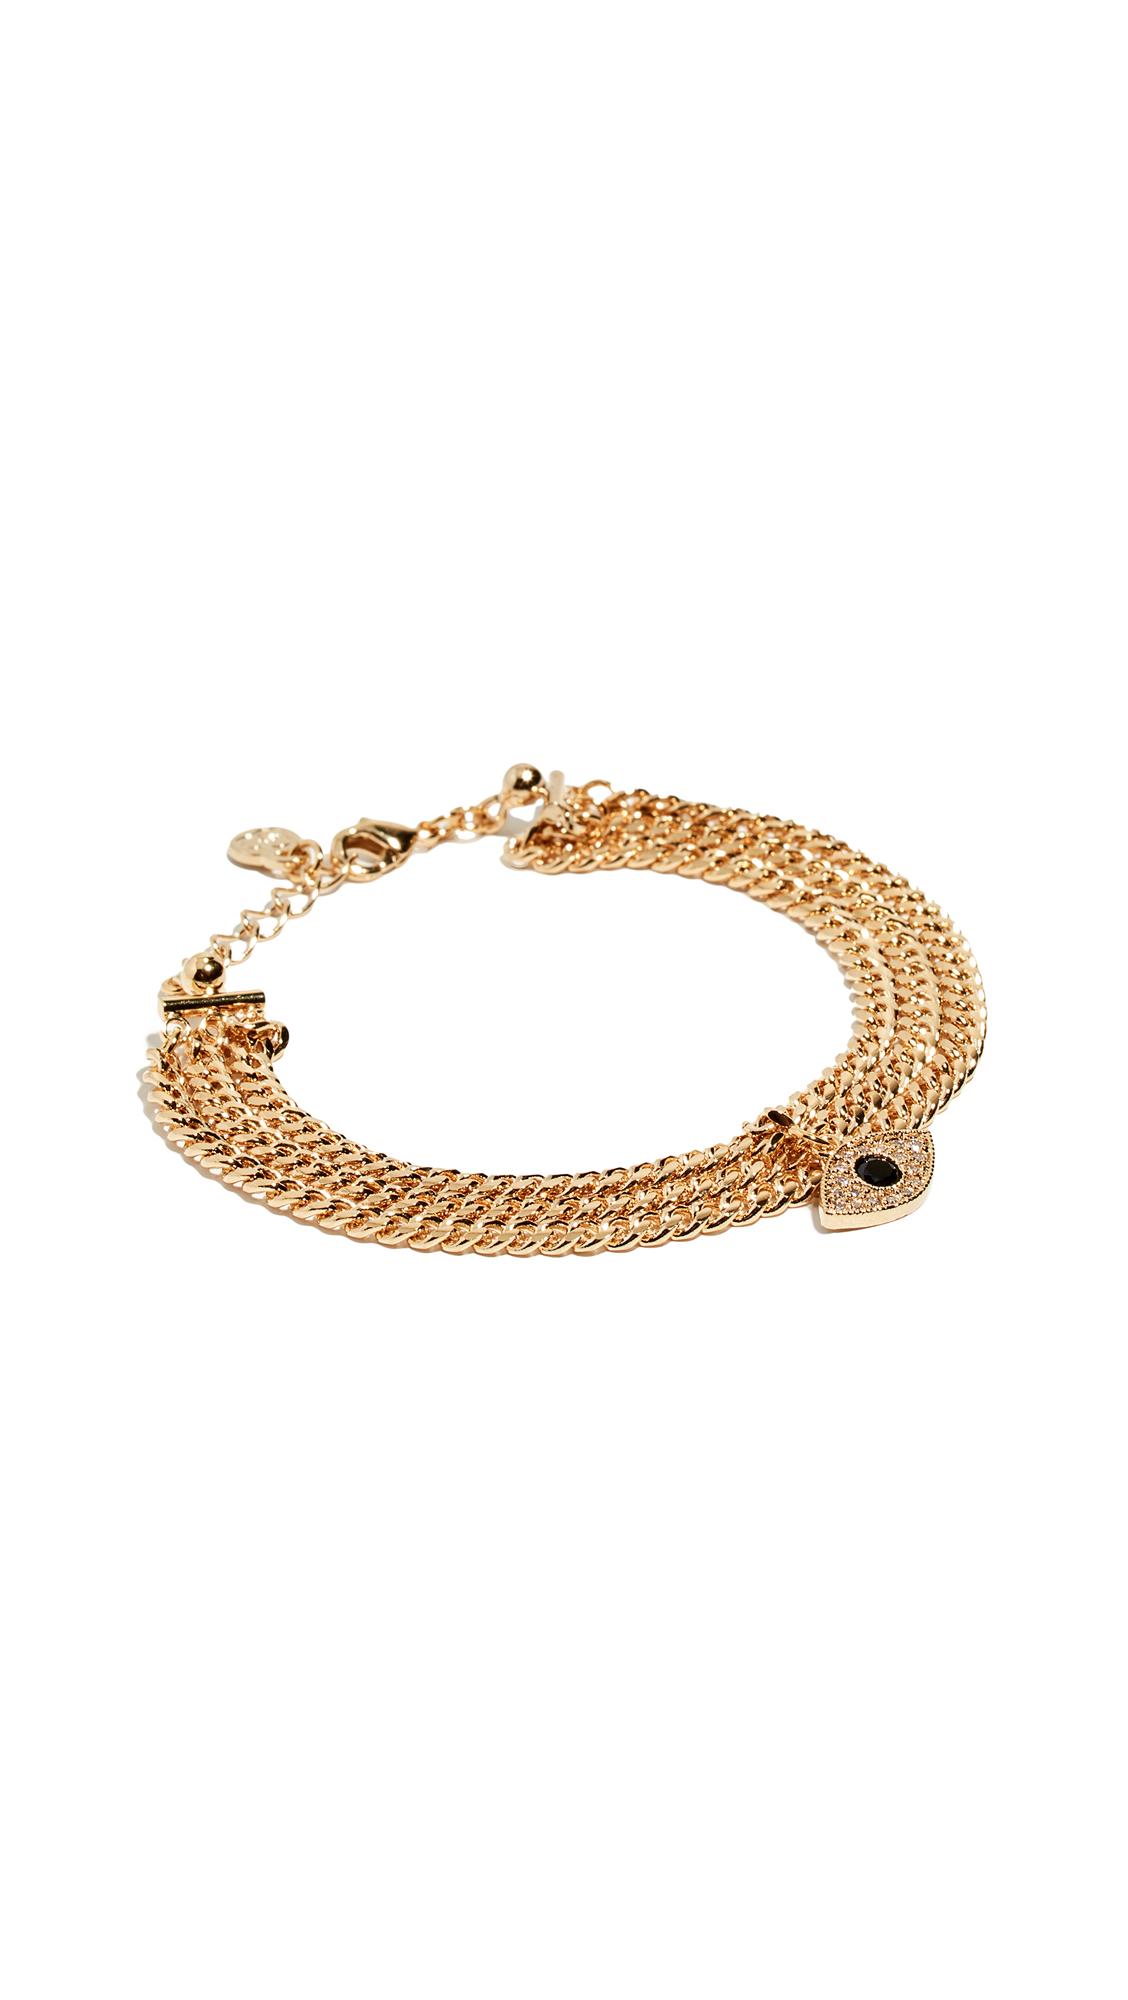 CLOVERPOST Evil Eye Snug Bracelet in Gold